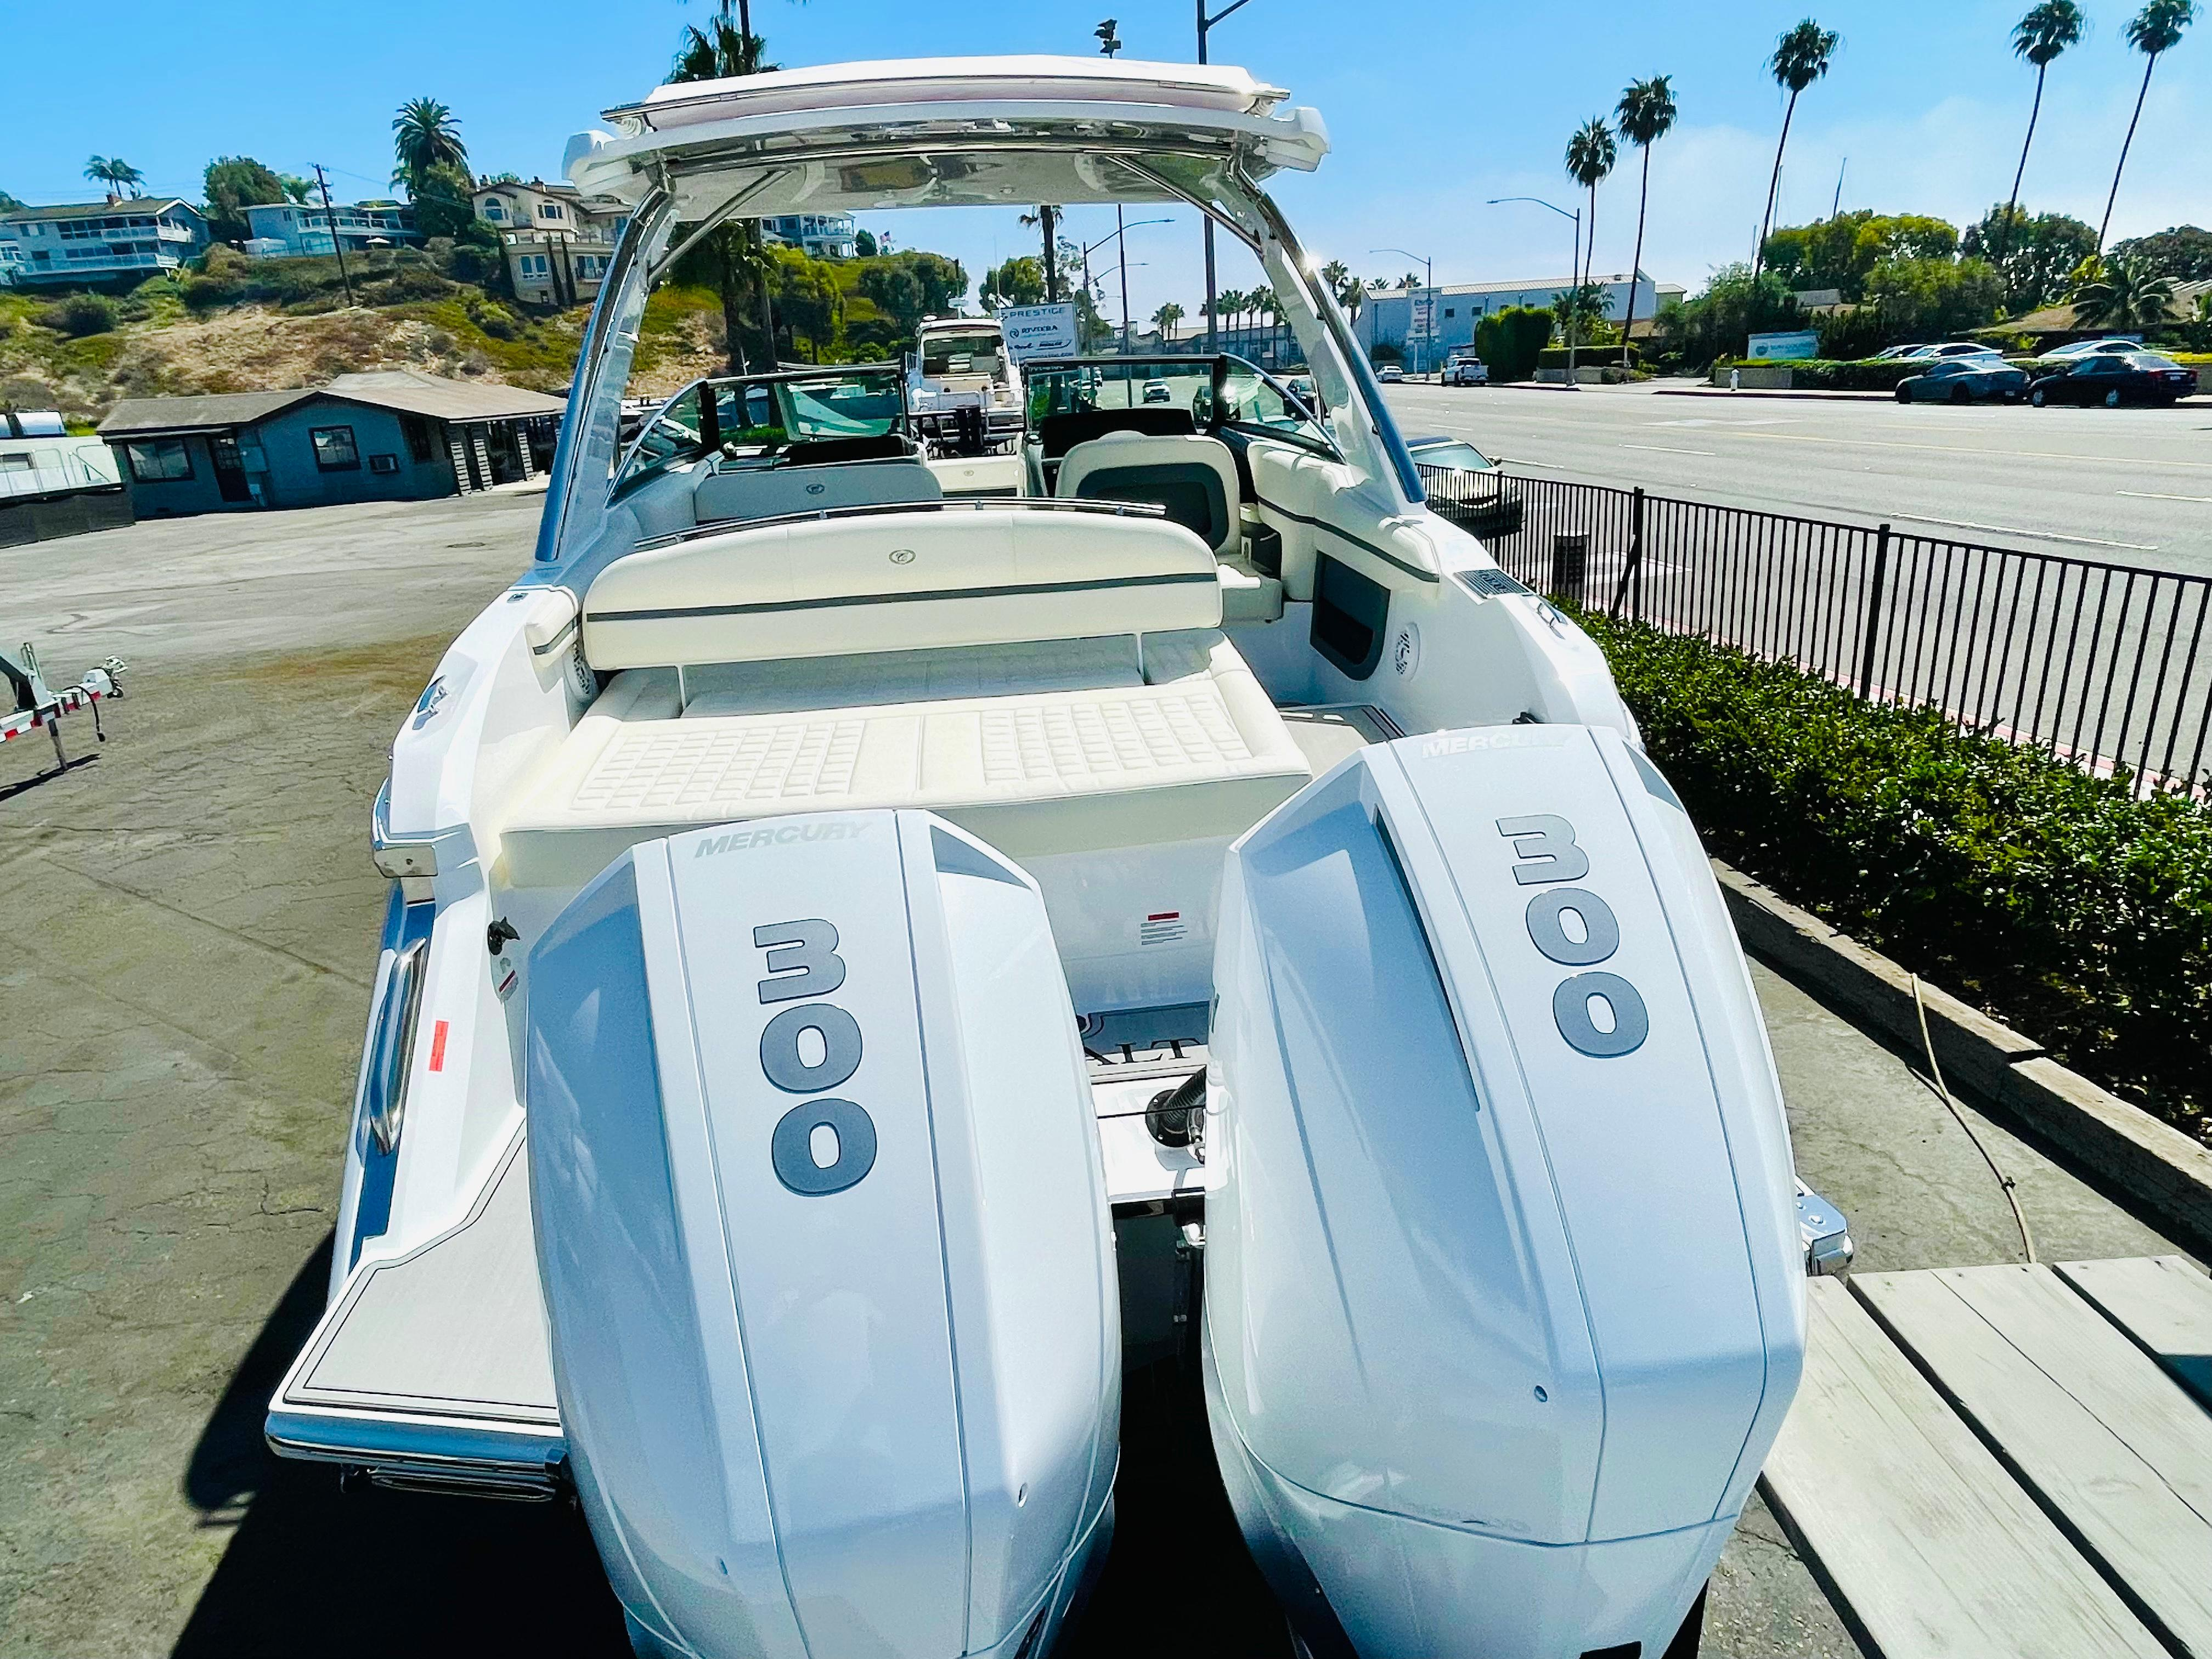 2022 Cobalt 30SC #C008H inventory image at Sun Country Coastal in Newport Beach